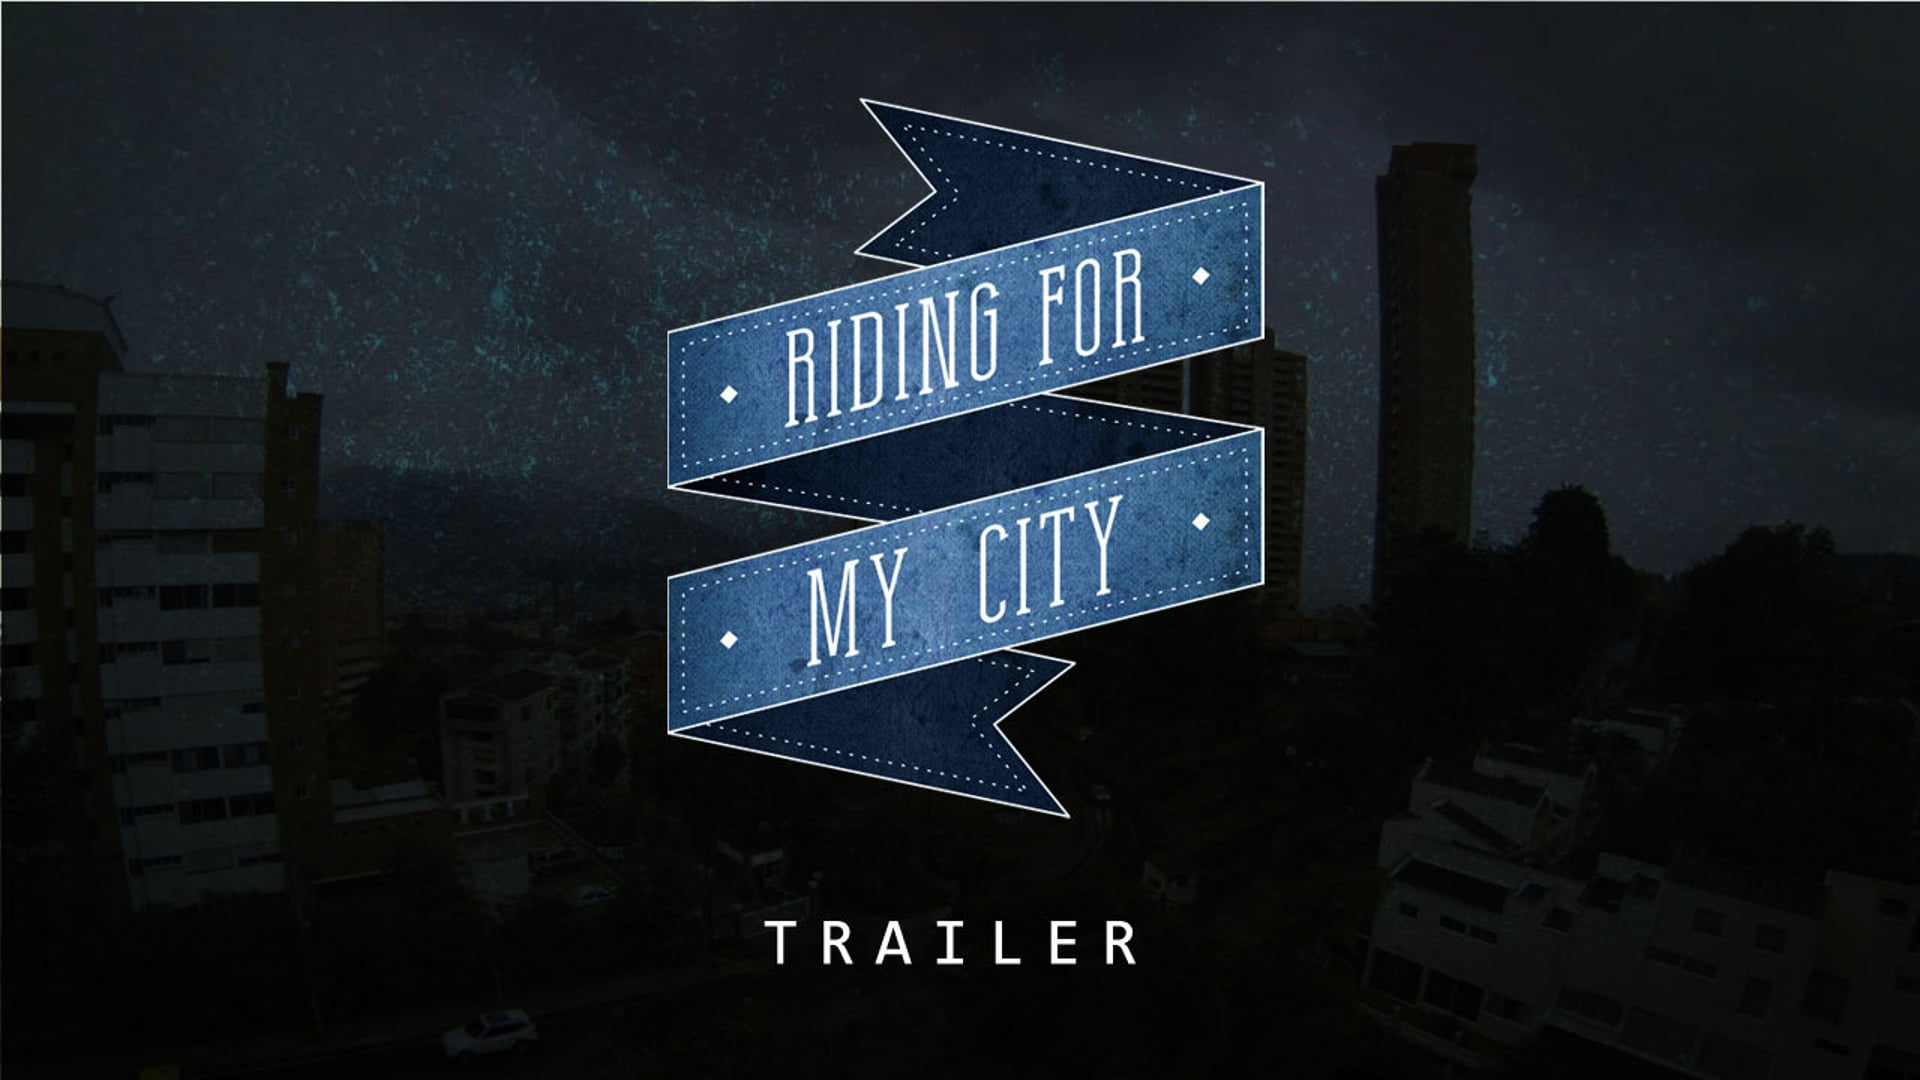 TRAILER - RIDING FOR MY CITY - MUTANTY BIKE CO